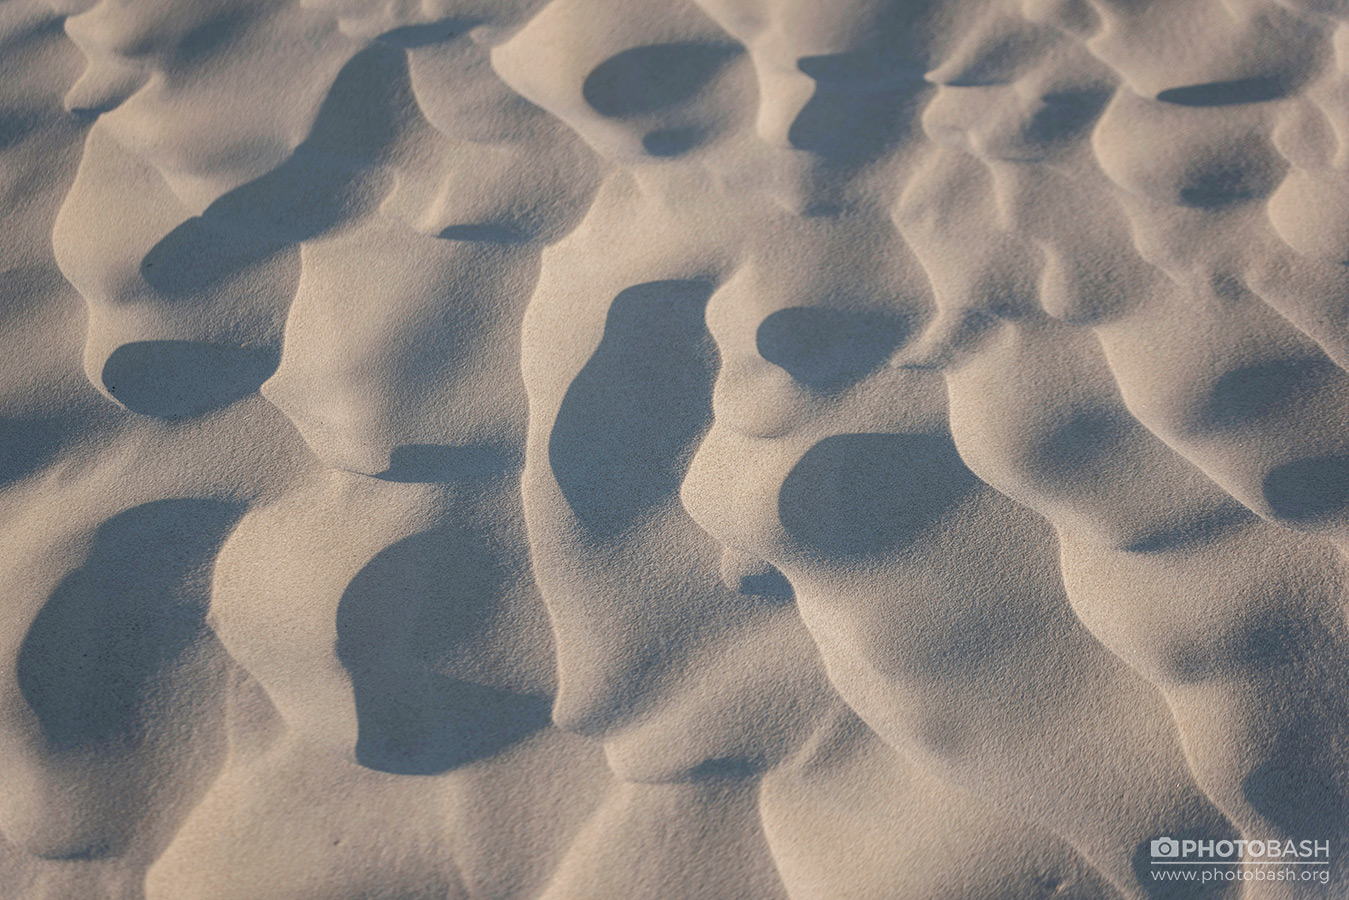 Coastal-Dunes-Beach-Sand-Texture.jpg